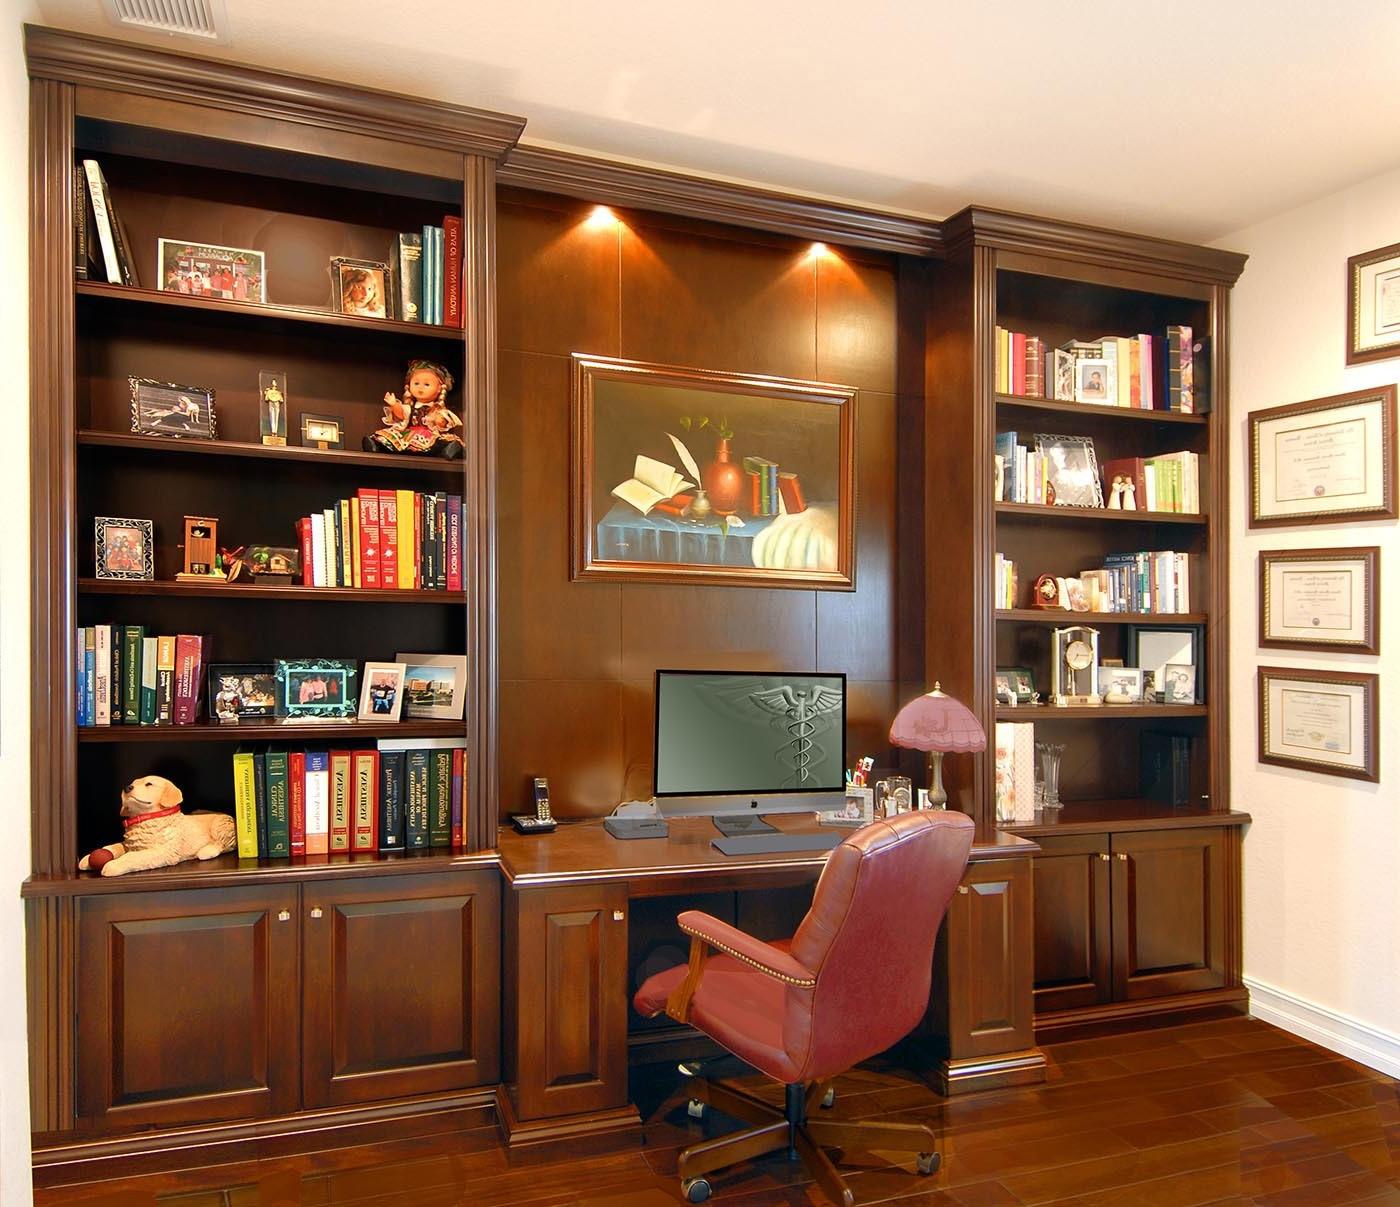 2018 Library Wall Bookshelves For Bookshelf Cabinet Wall Unit Full Wall Bookshelves Diy High (View 2 of 15)